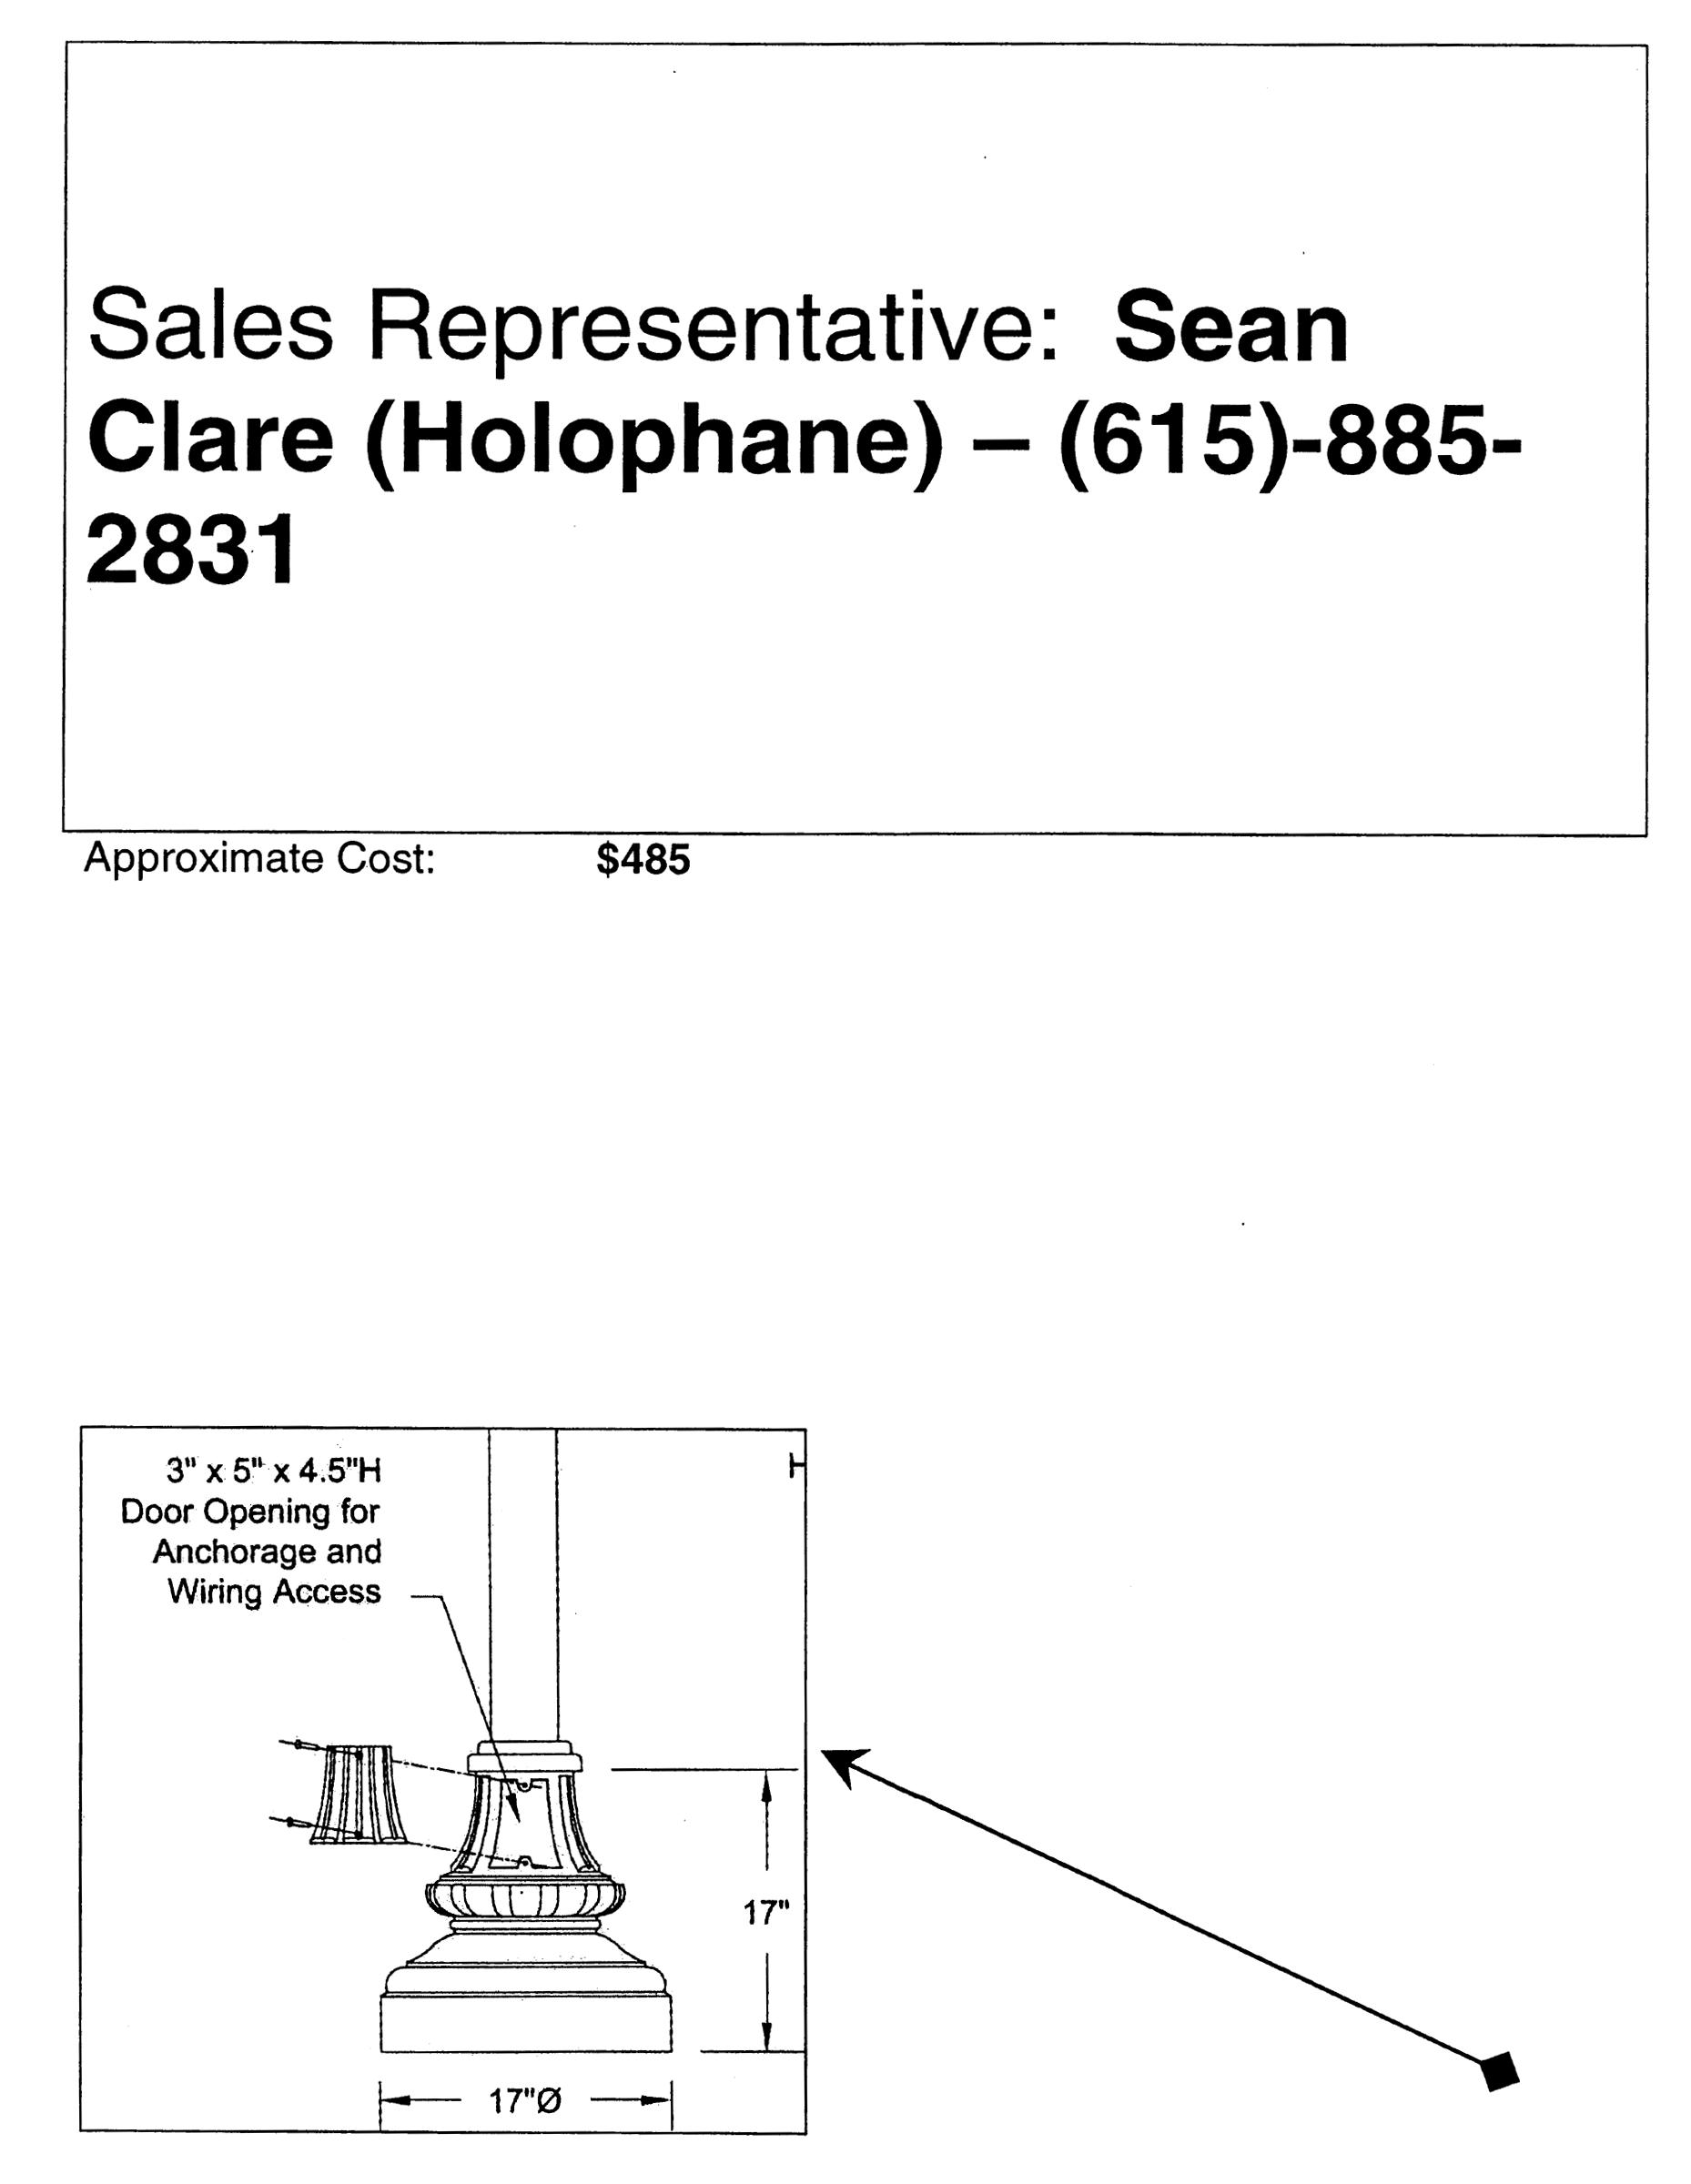 street light wiring diagram appendix c residential street light criteria code of  appendix c residential street light